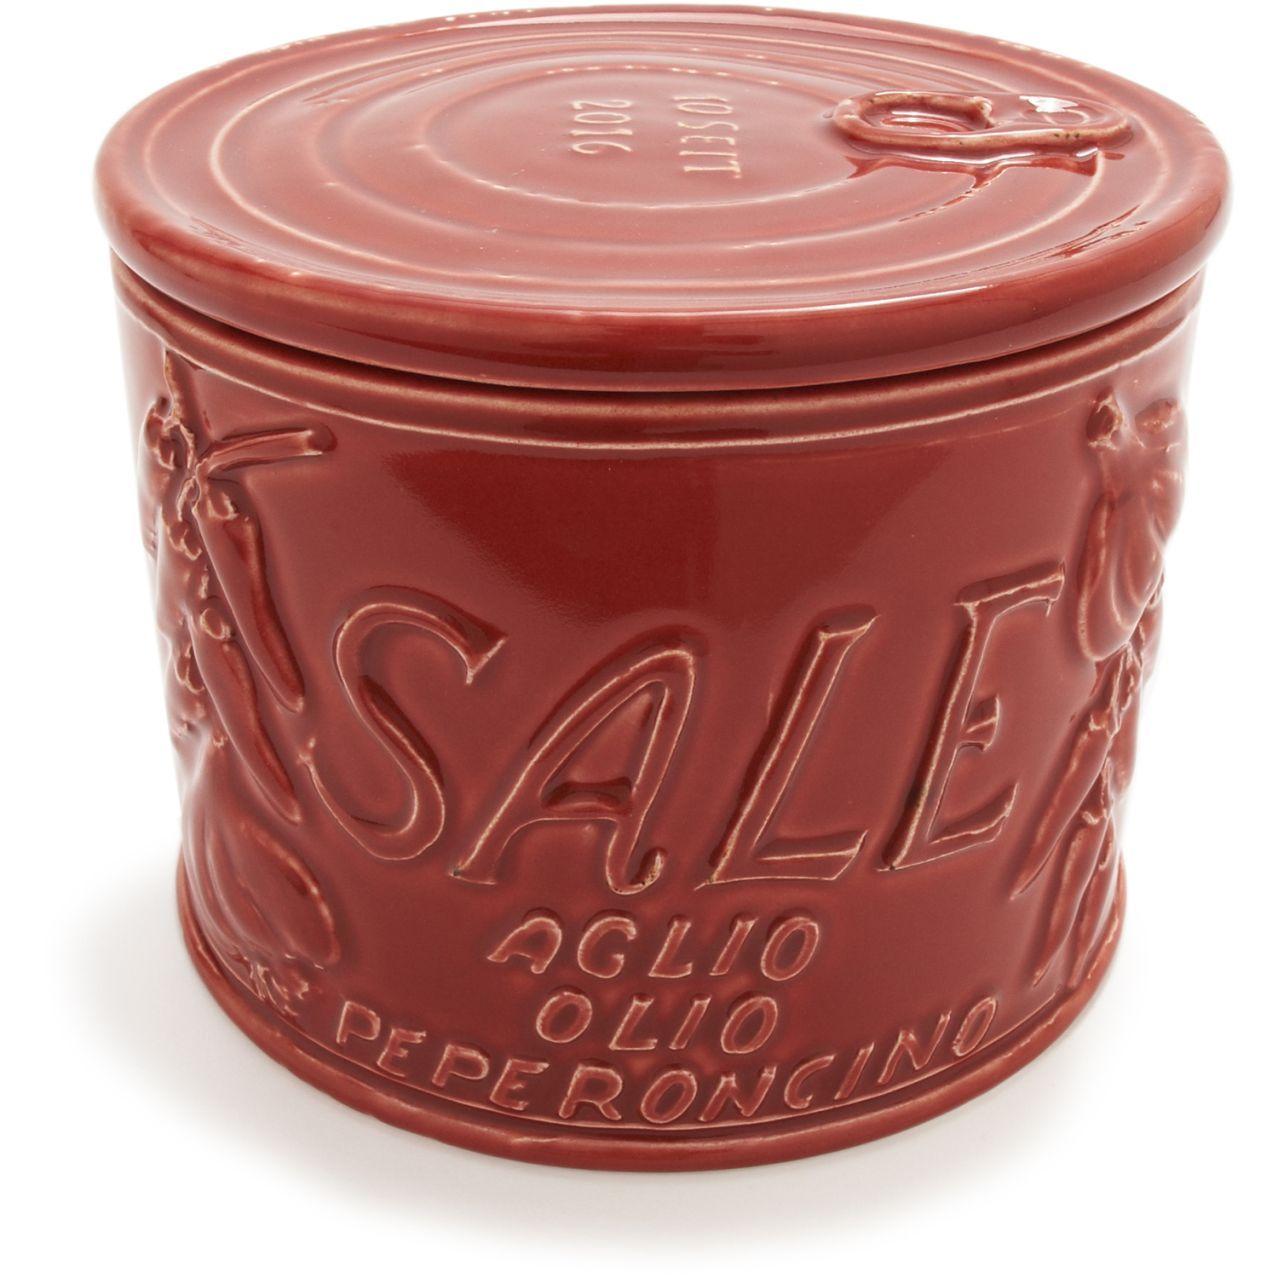 italian ceramic round salt boxes sur la table for the